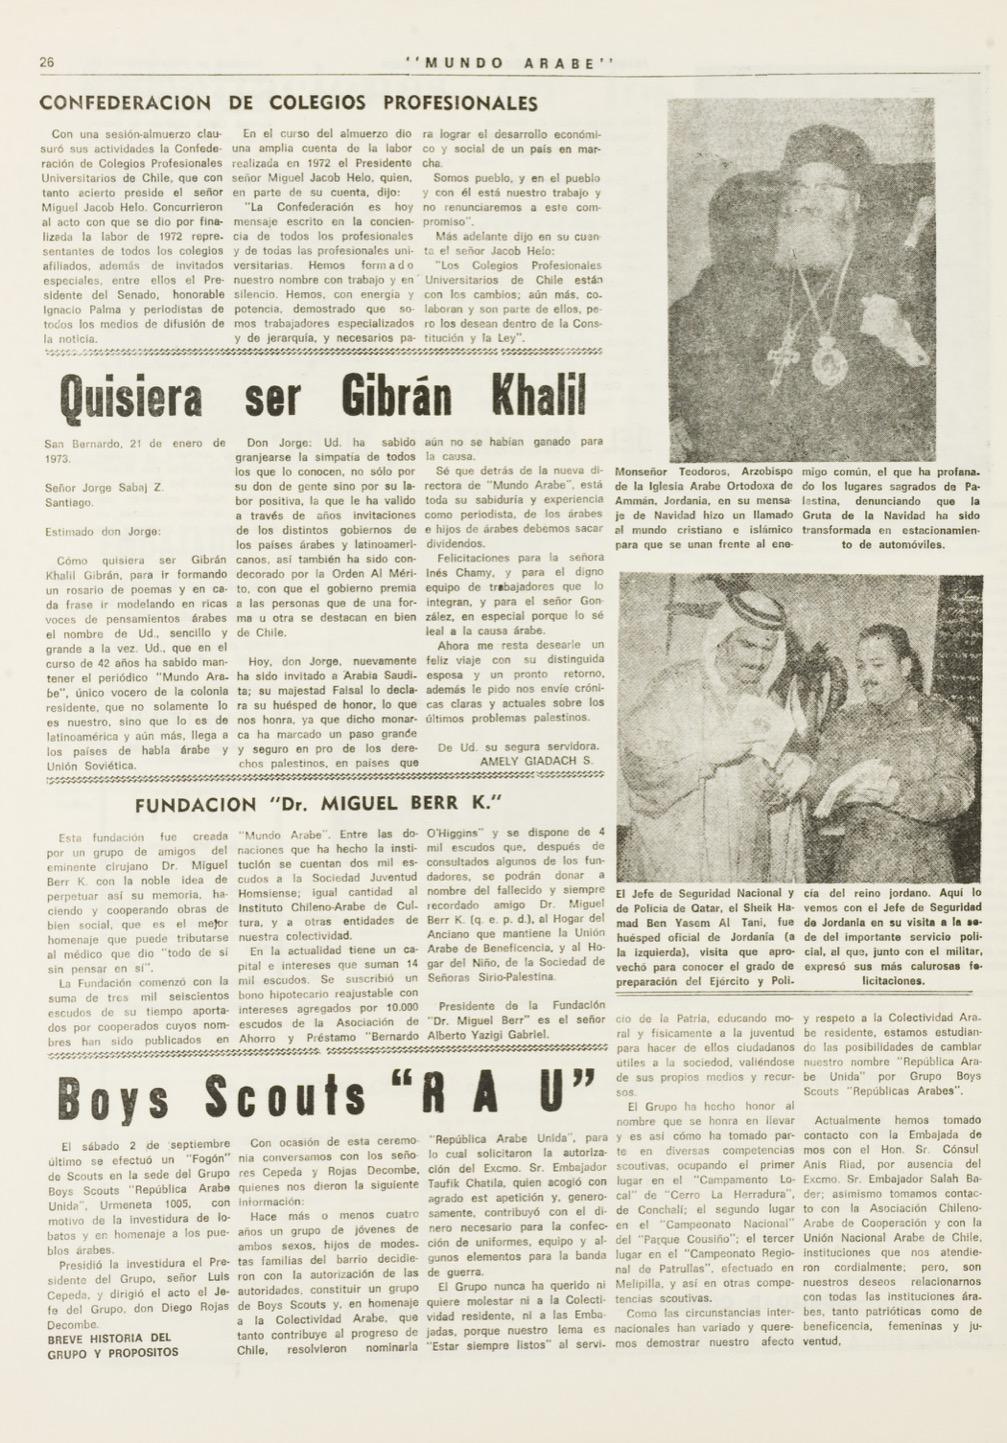 "Amely Giadach, ""Quisiera ser Gibrán Khalil"", Mundo Árabe, Jan 1, 1973, p. 26."